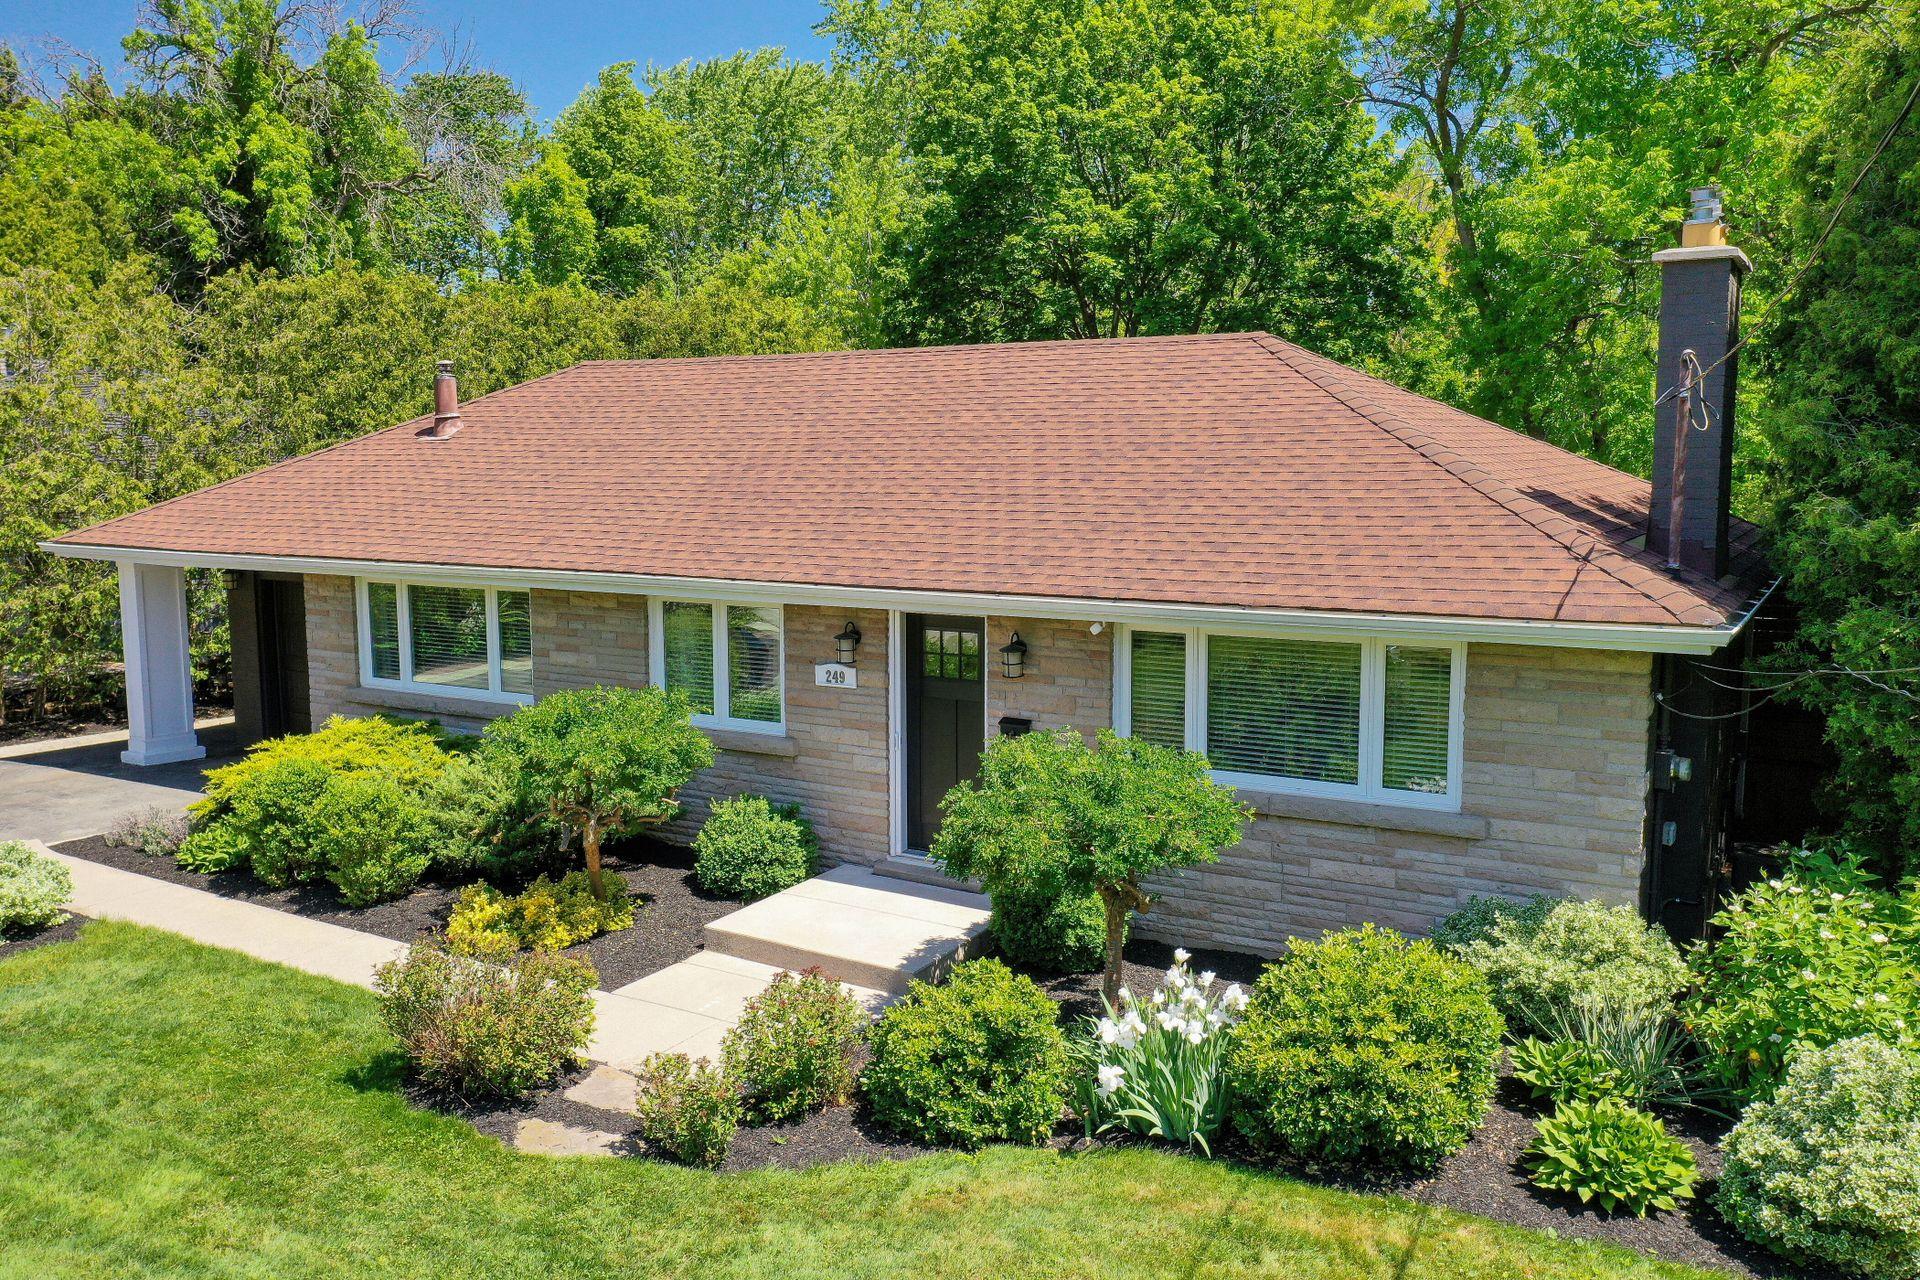 249-lakeview-ave-burlington-exterior-front at 249 Lakeview Ave, Burlington,